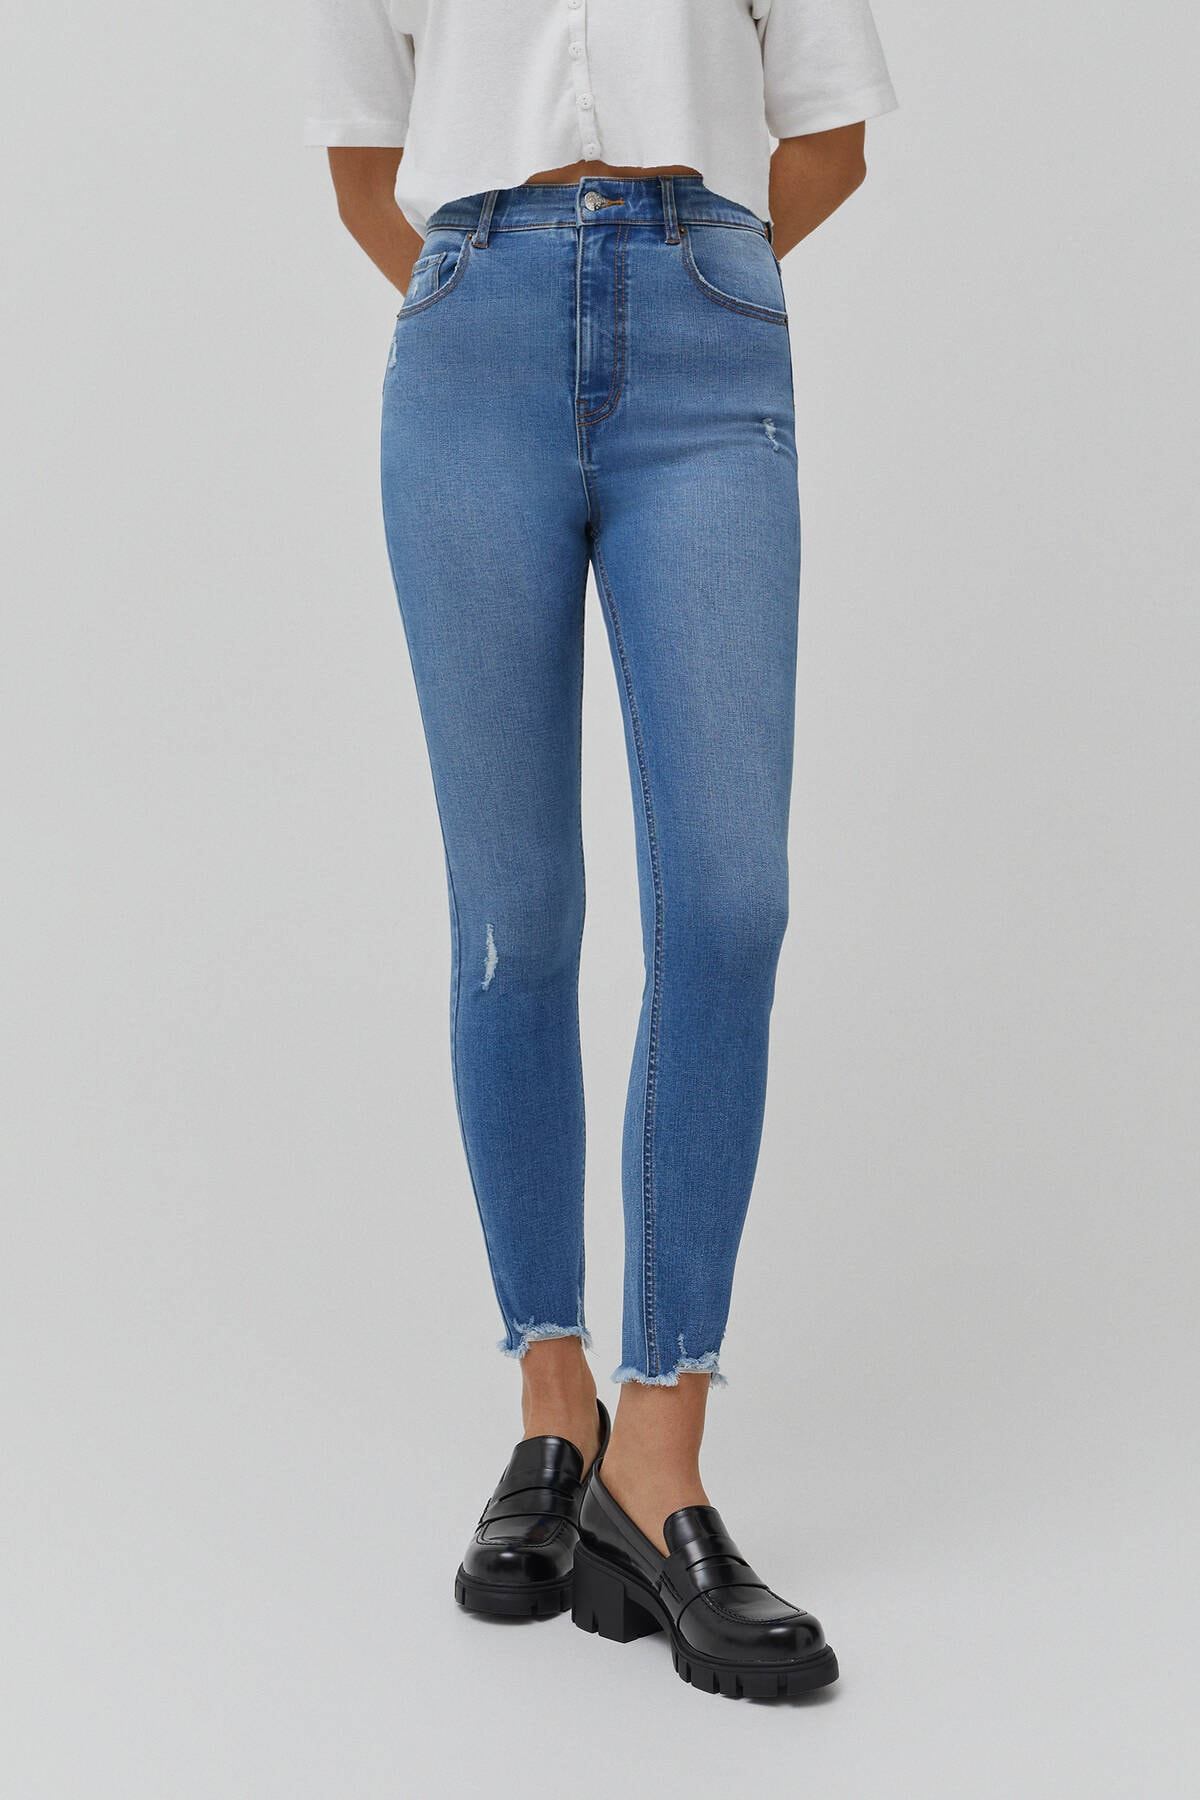 Pull & Bear Kadın  Mavi Yüksek Bel Skinny Fit Kapri Jean 09689301 2